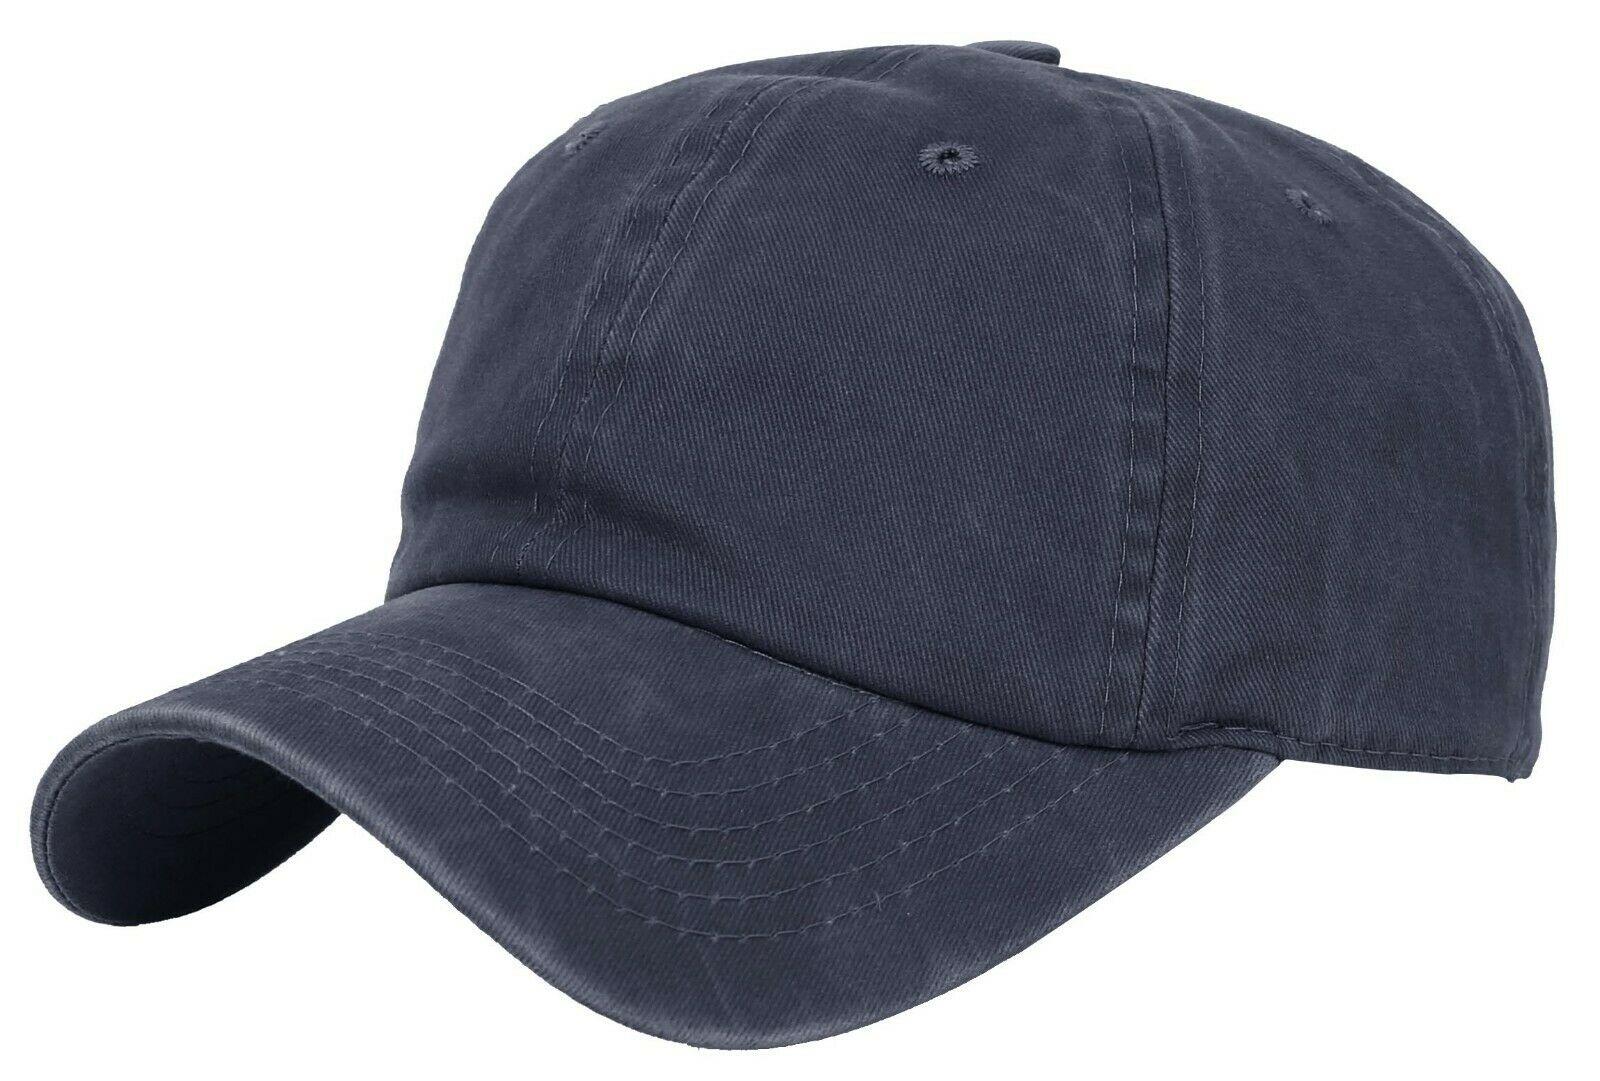 BASEBALL-CAP-Plain-Dad-Hat-Low-Profile-Vintage-Washed-Pigment-Adjustable thumbnail 4